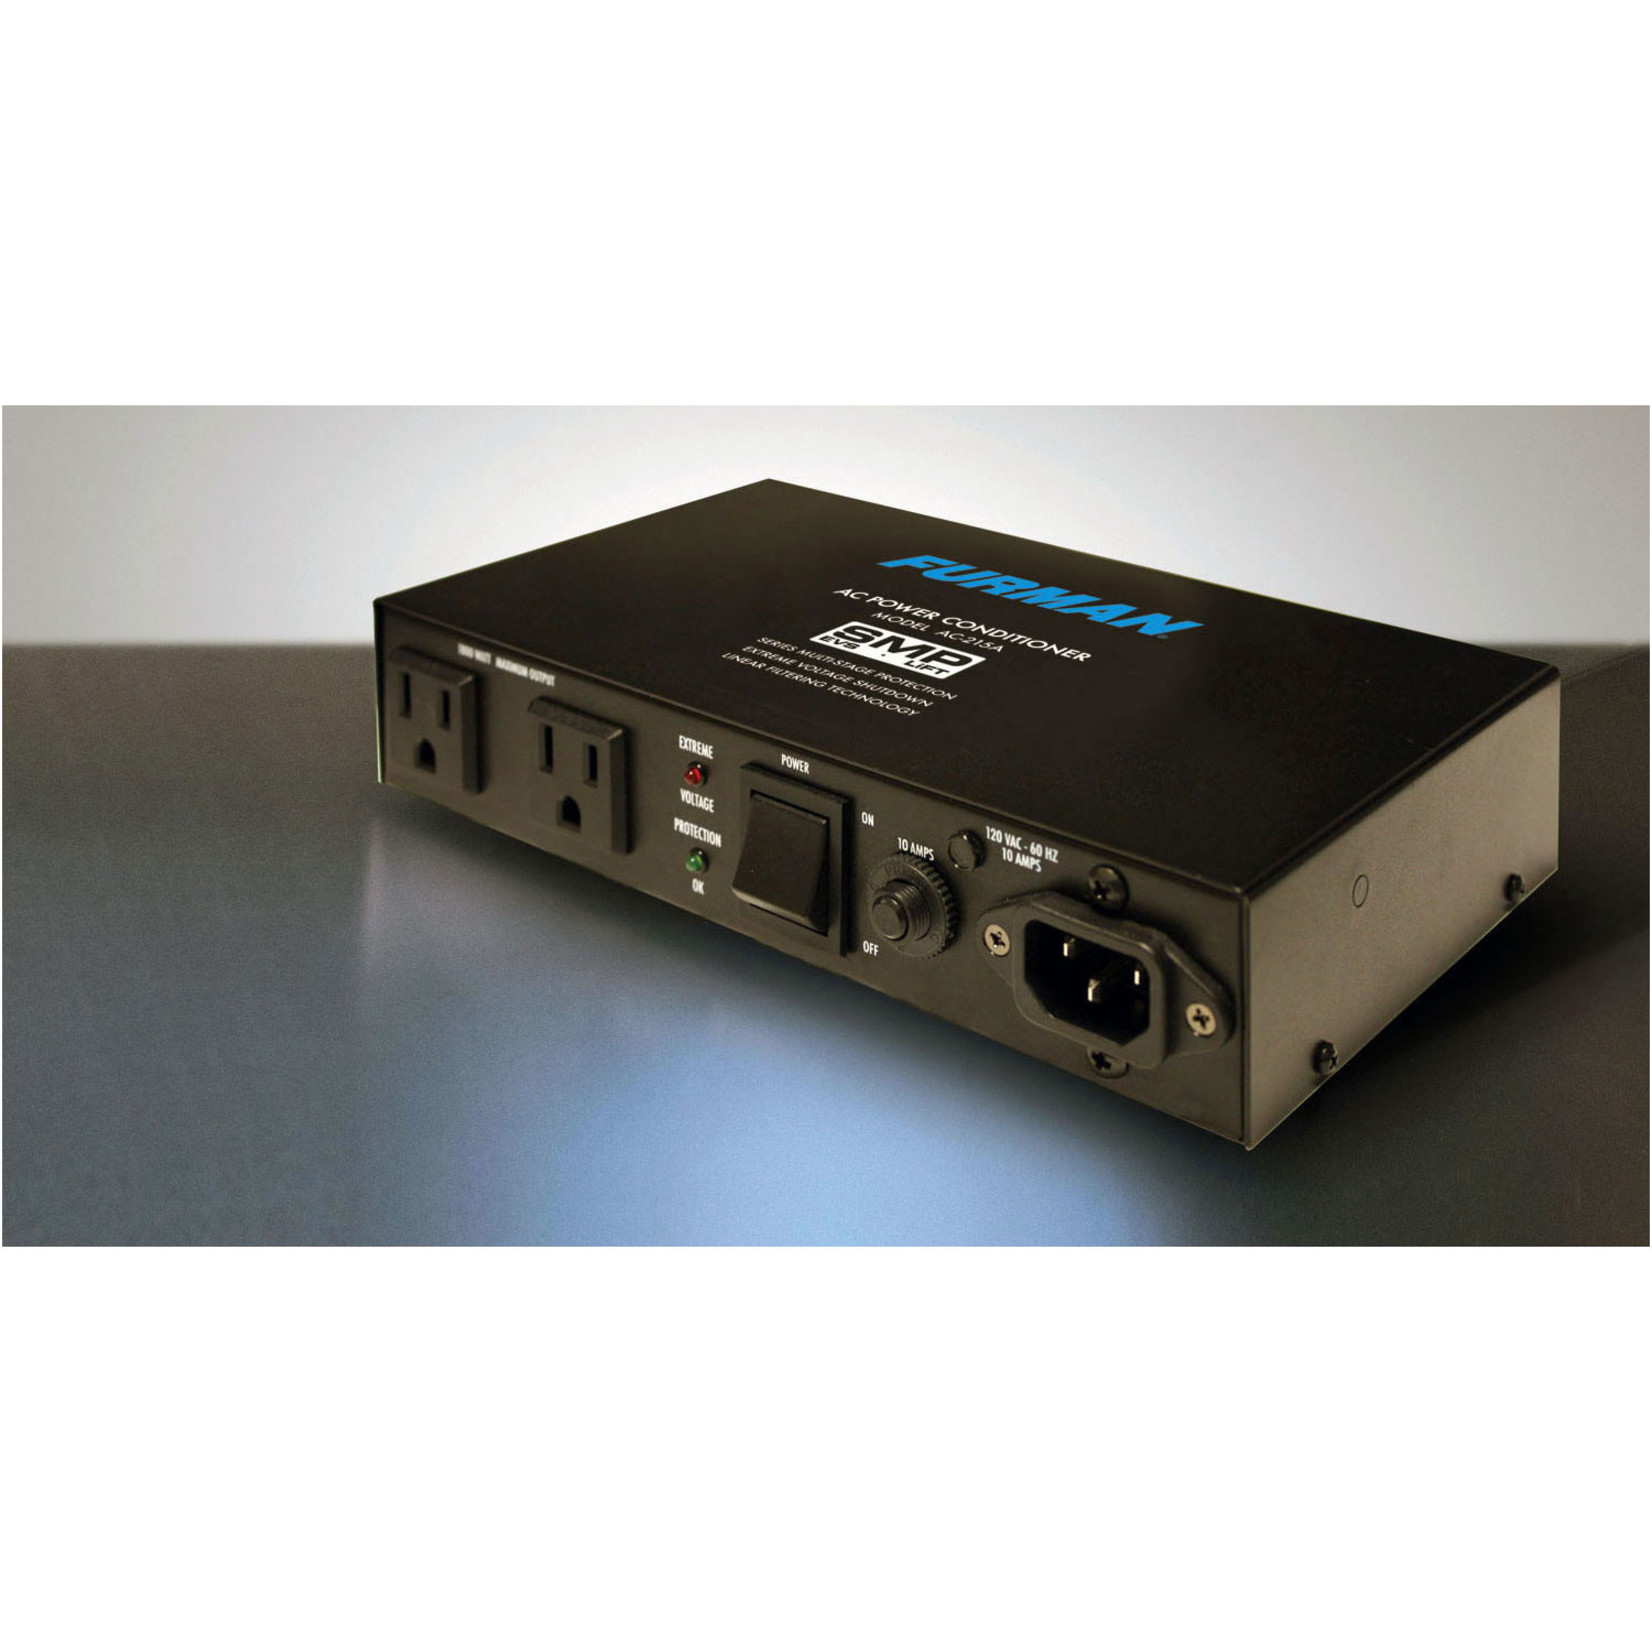 Furman Furman AC-215A Compact Power Conditioner